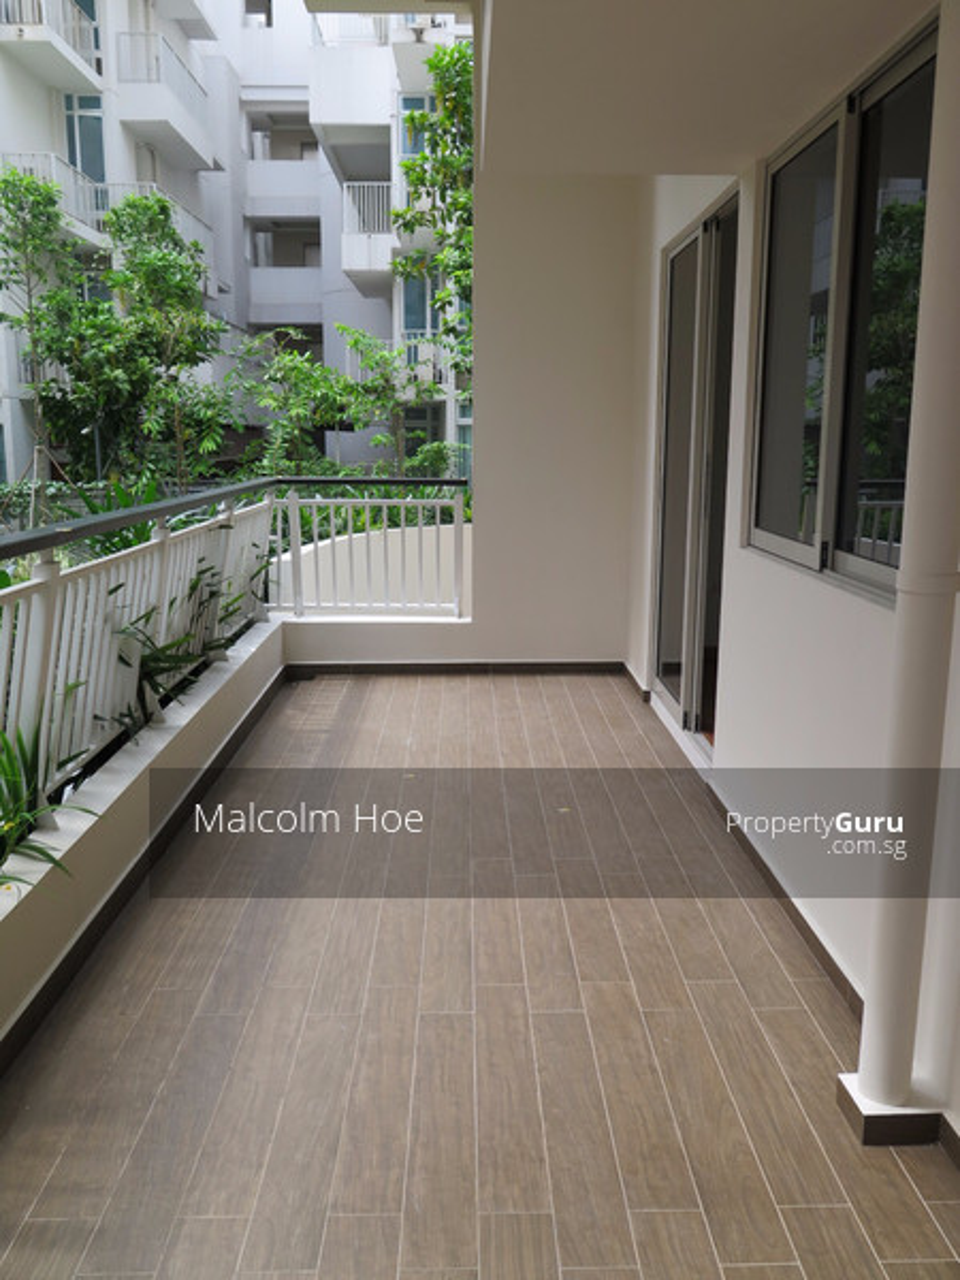 Whitehaven 334a Pasir Panjang Road 2 Bedrooms 624 Sqft Condominiums Apartments And